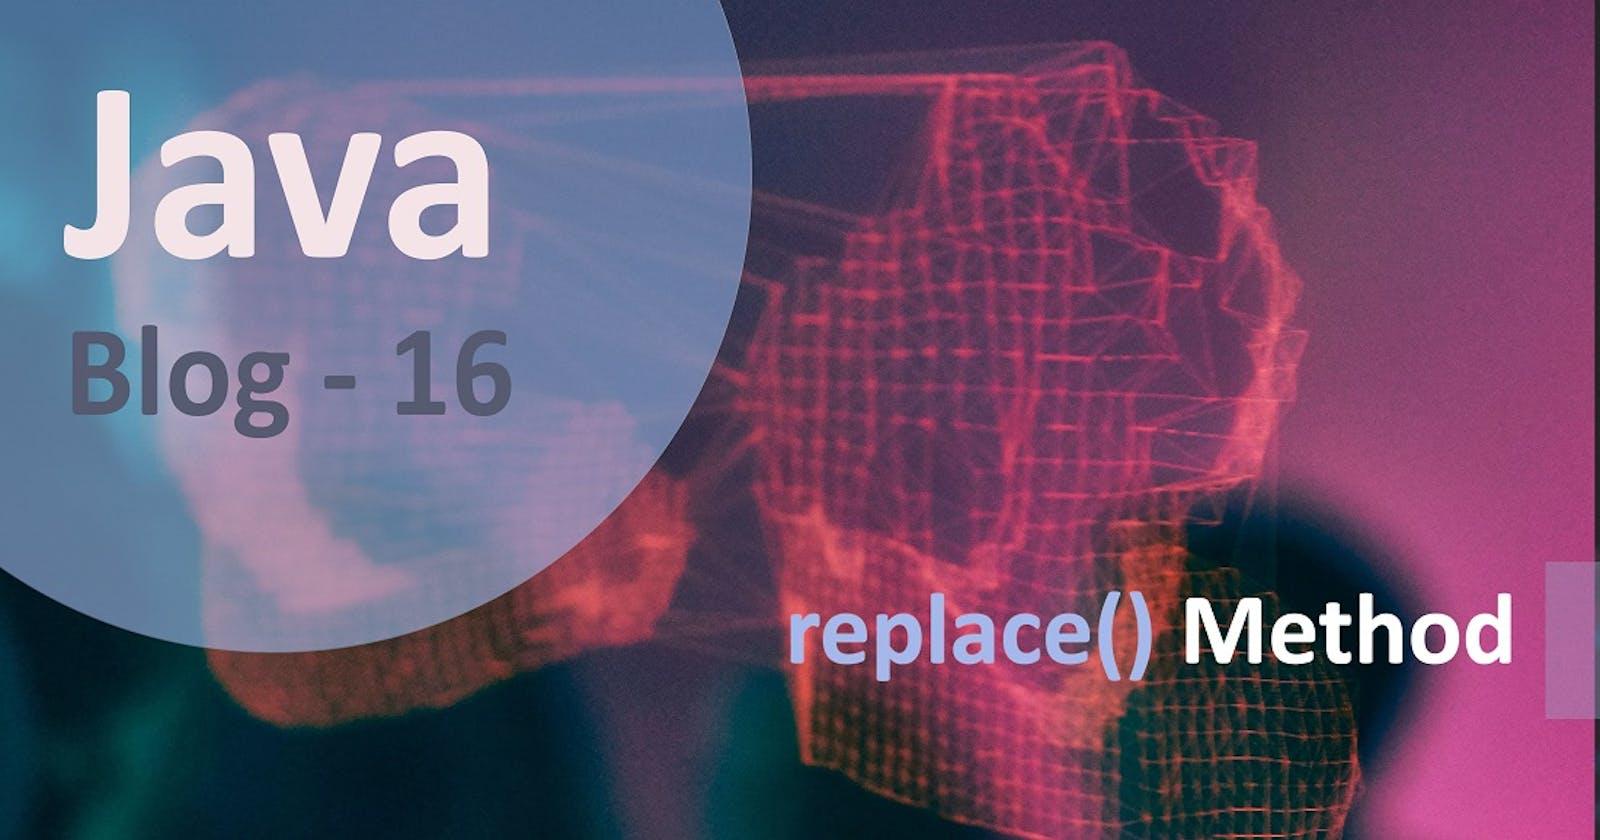 Java replace() Method